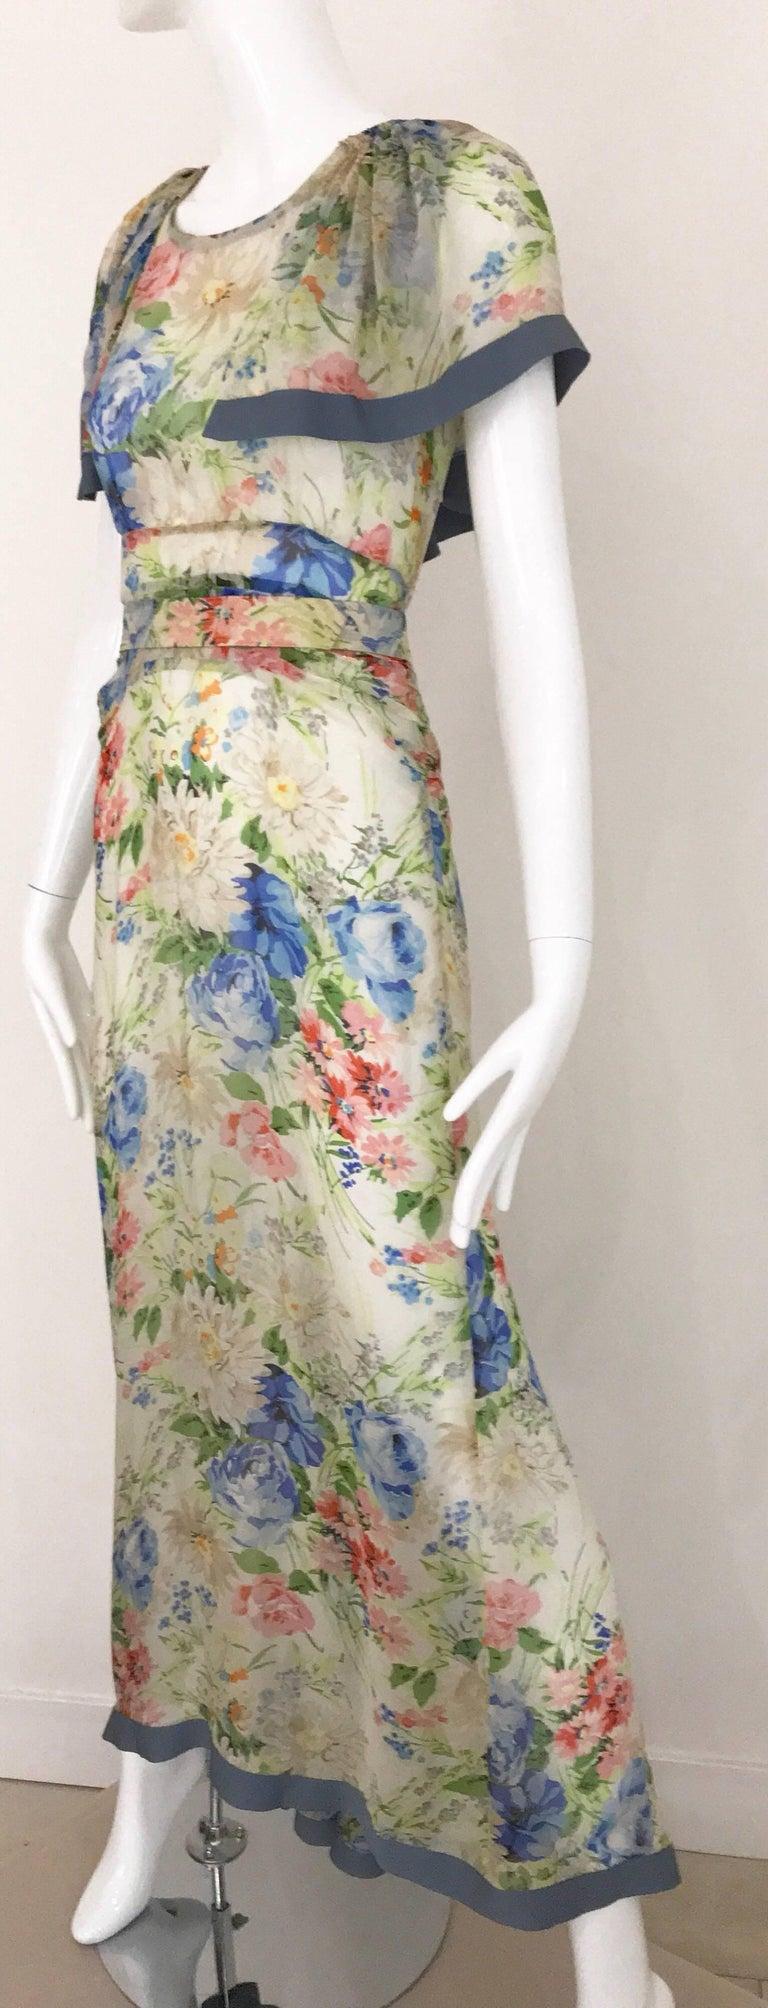 Women's 1930s Floral Print Silk Dress For Sale